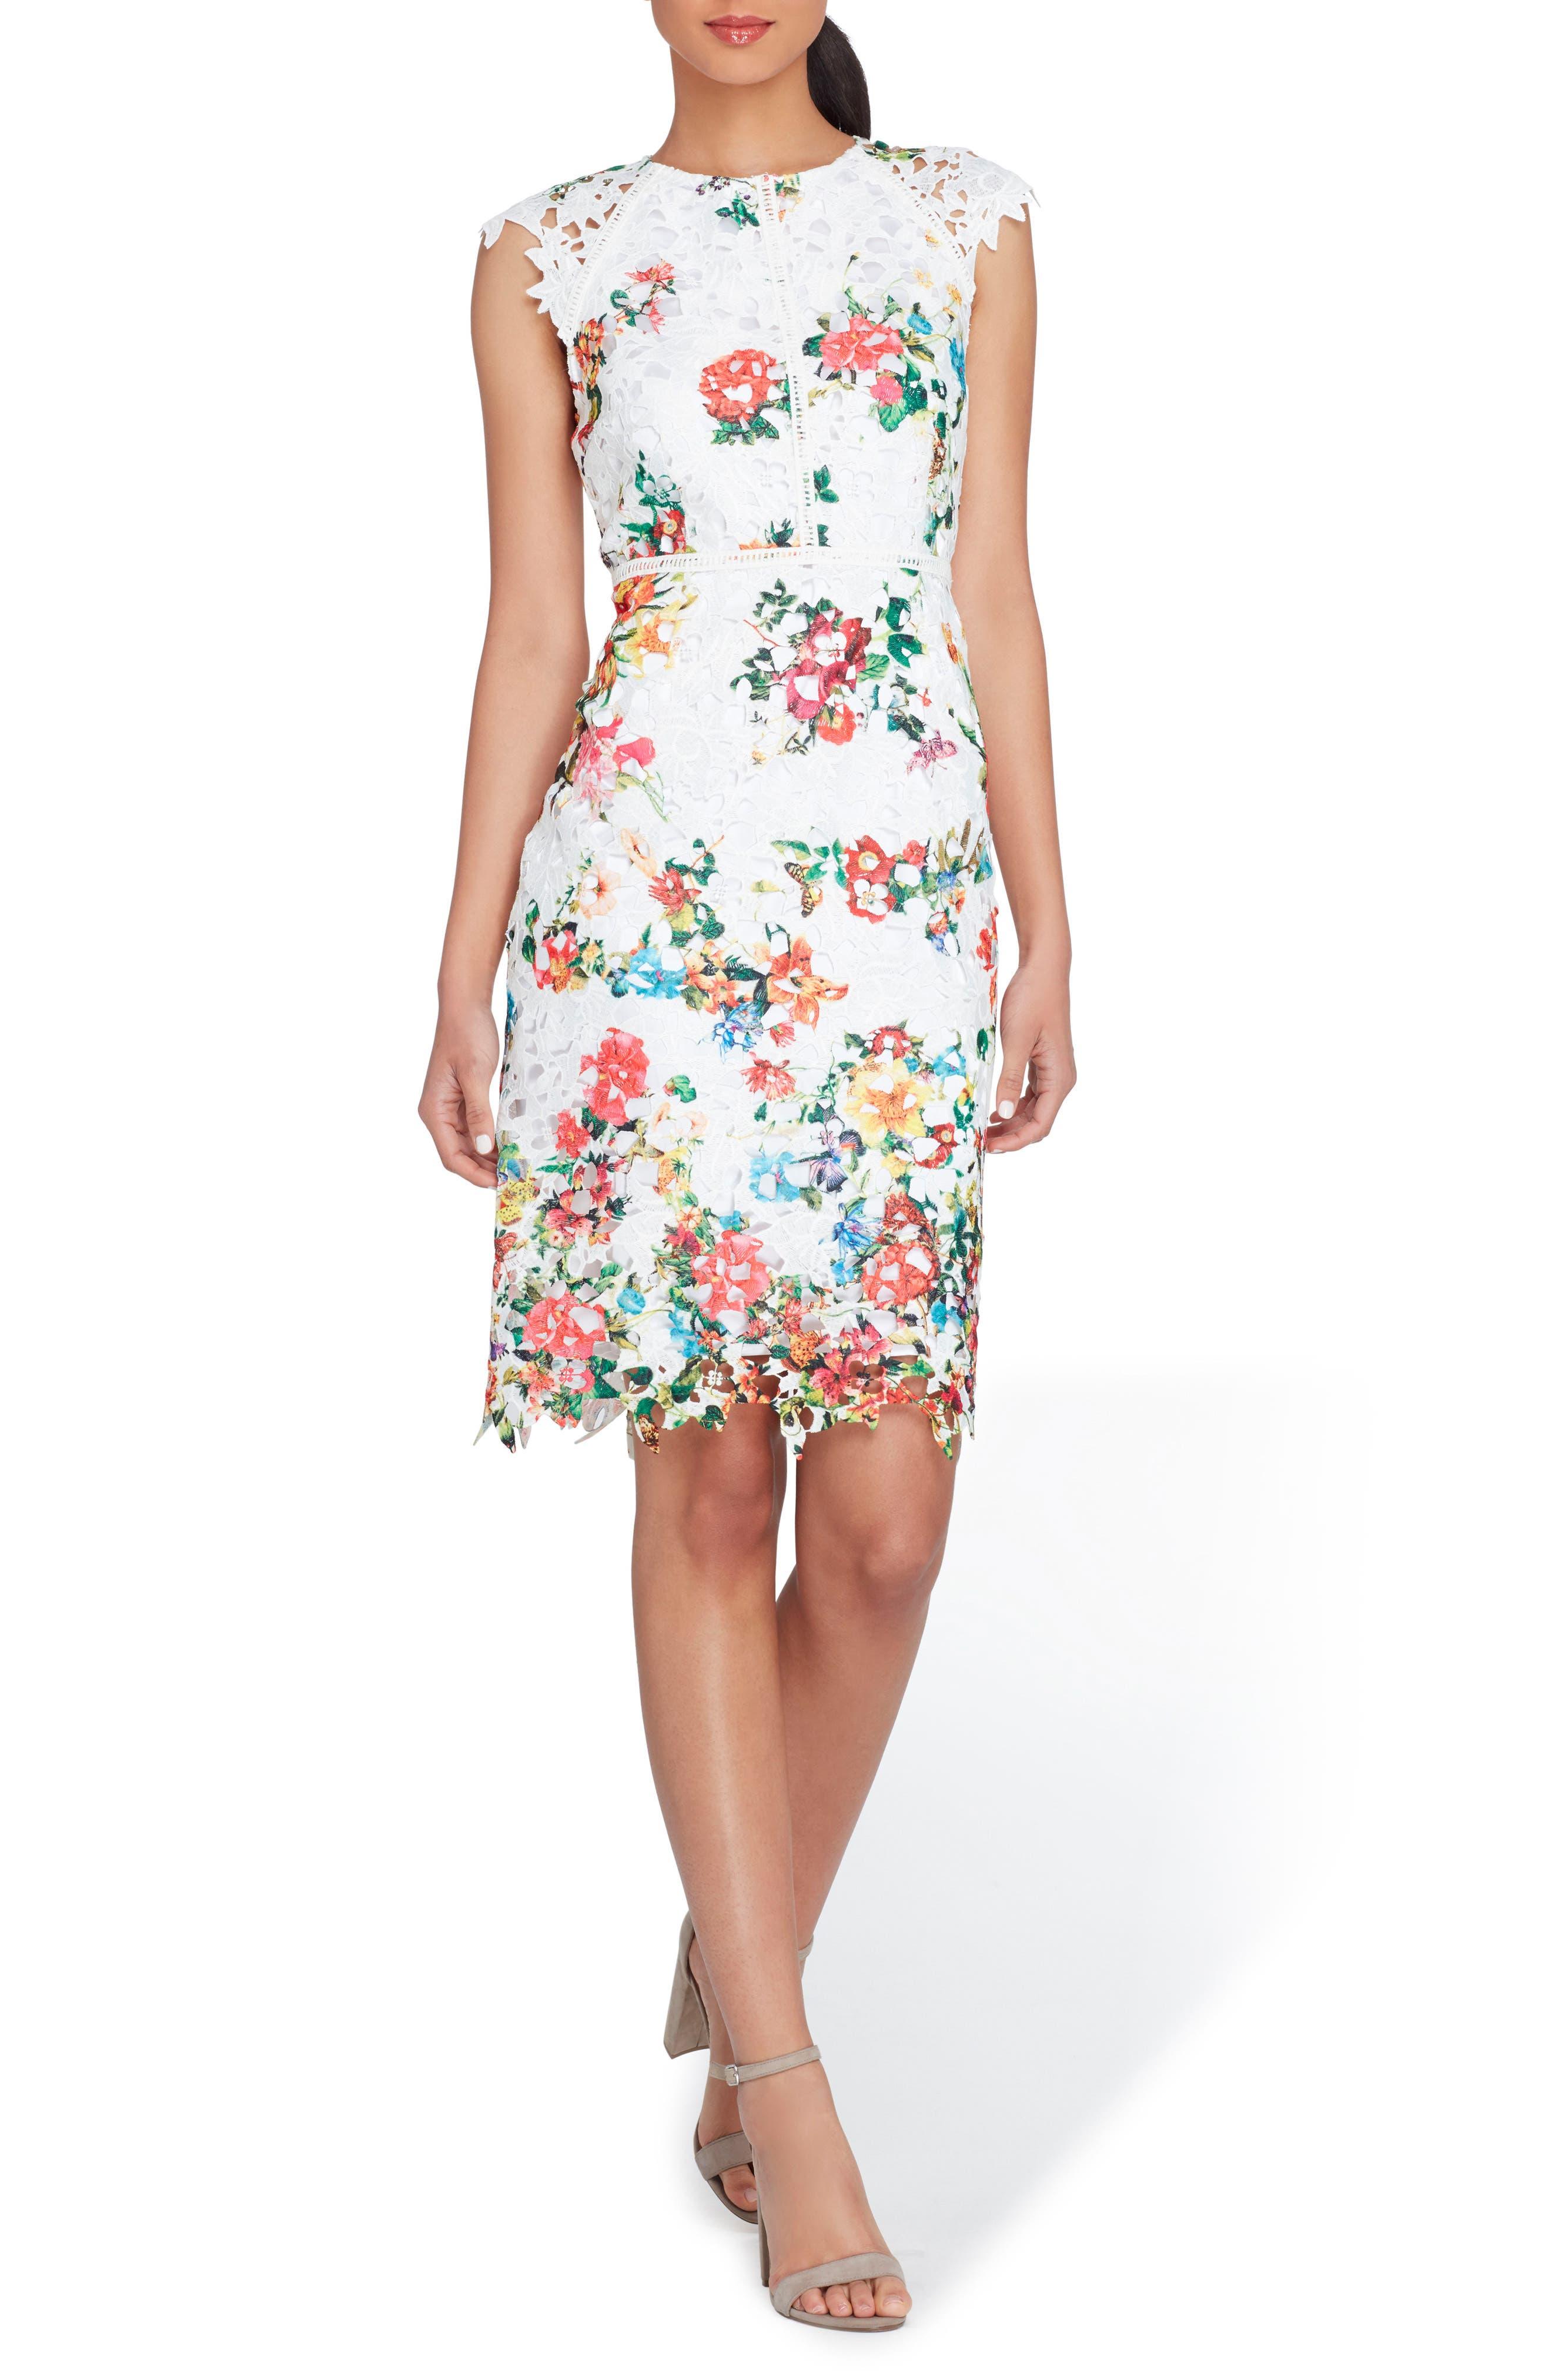 Alternate Image 1 Selected - Tahari Floral Print Lace Sheath Dress